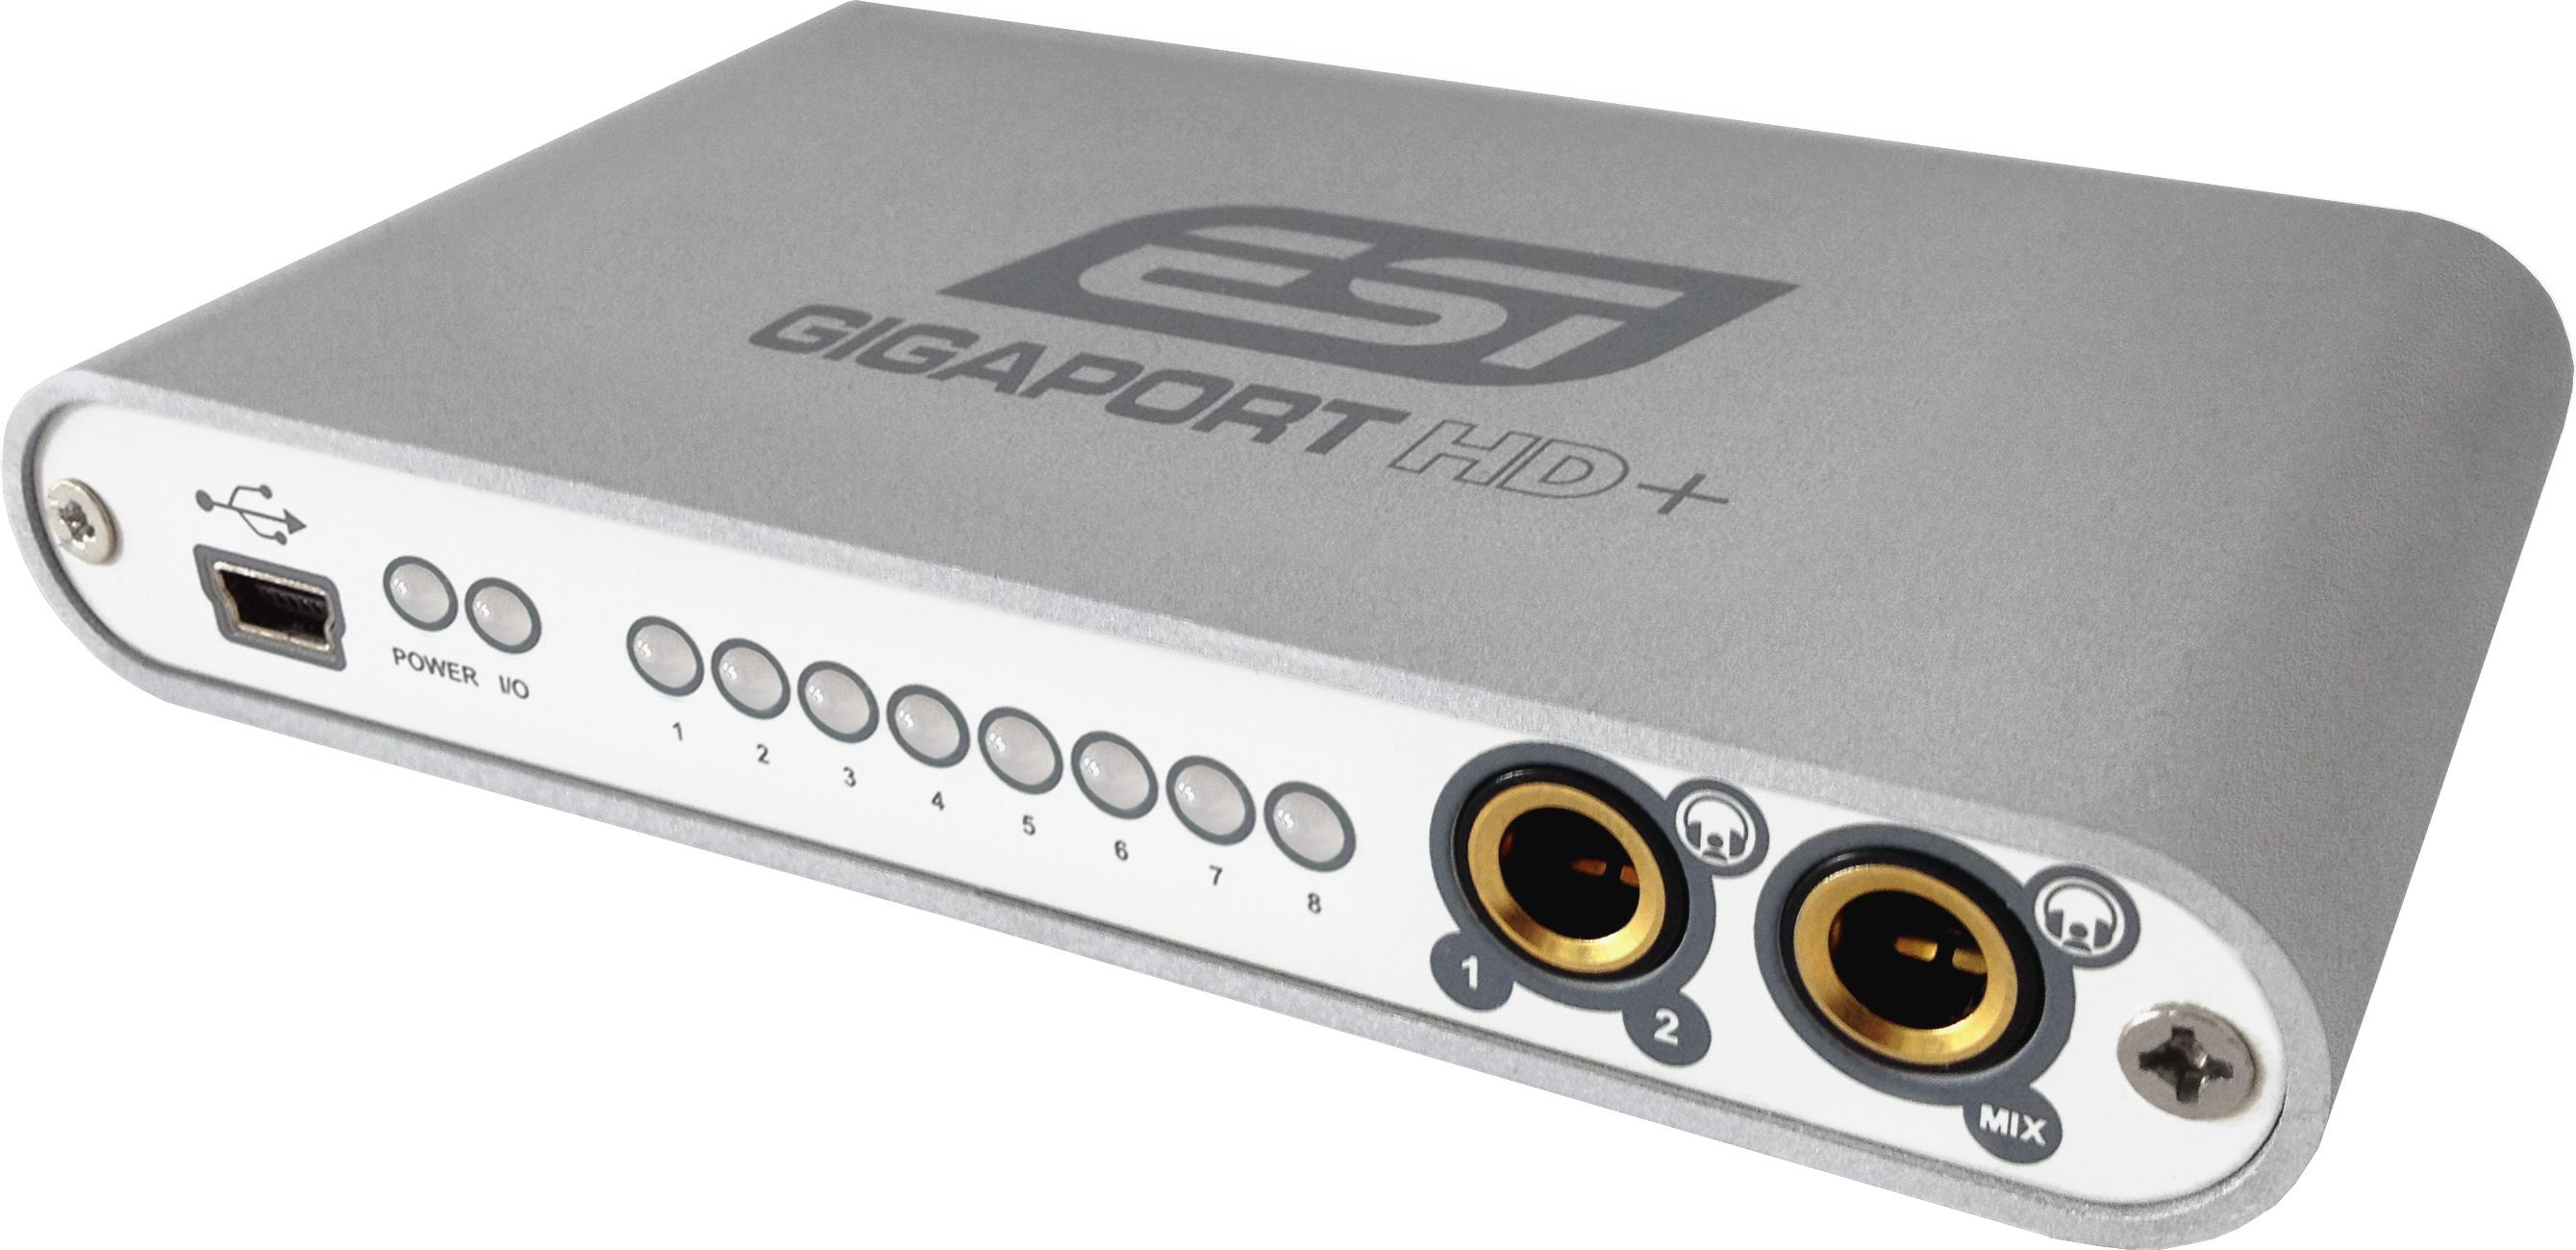 ESI M8U XL Audio Interface Windows 8 Driver Download